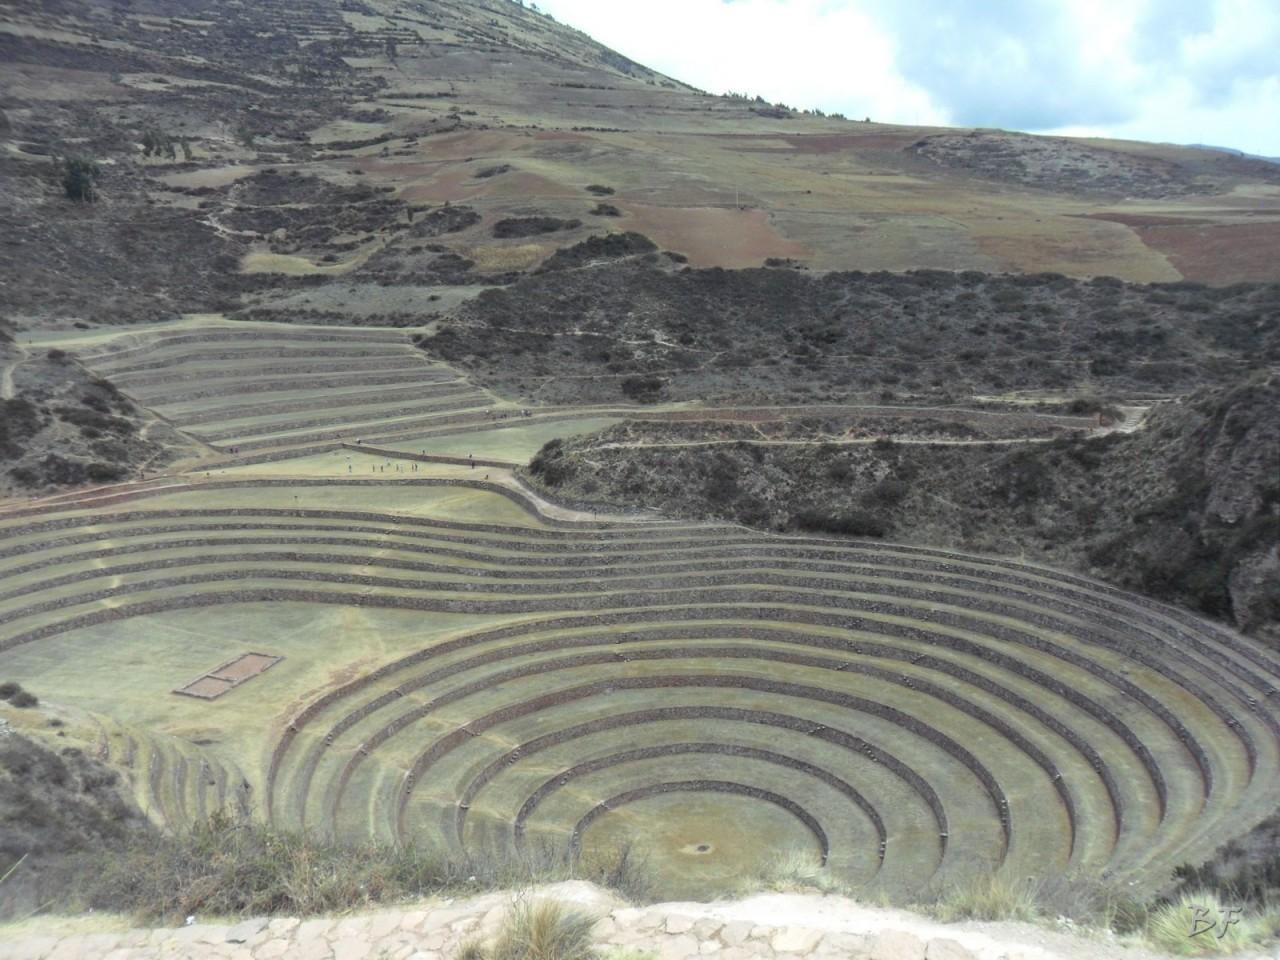 Terrazze-Circolari-Megaliti-Moray-Saline-Maras-Cusco-Perù-22